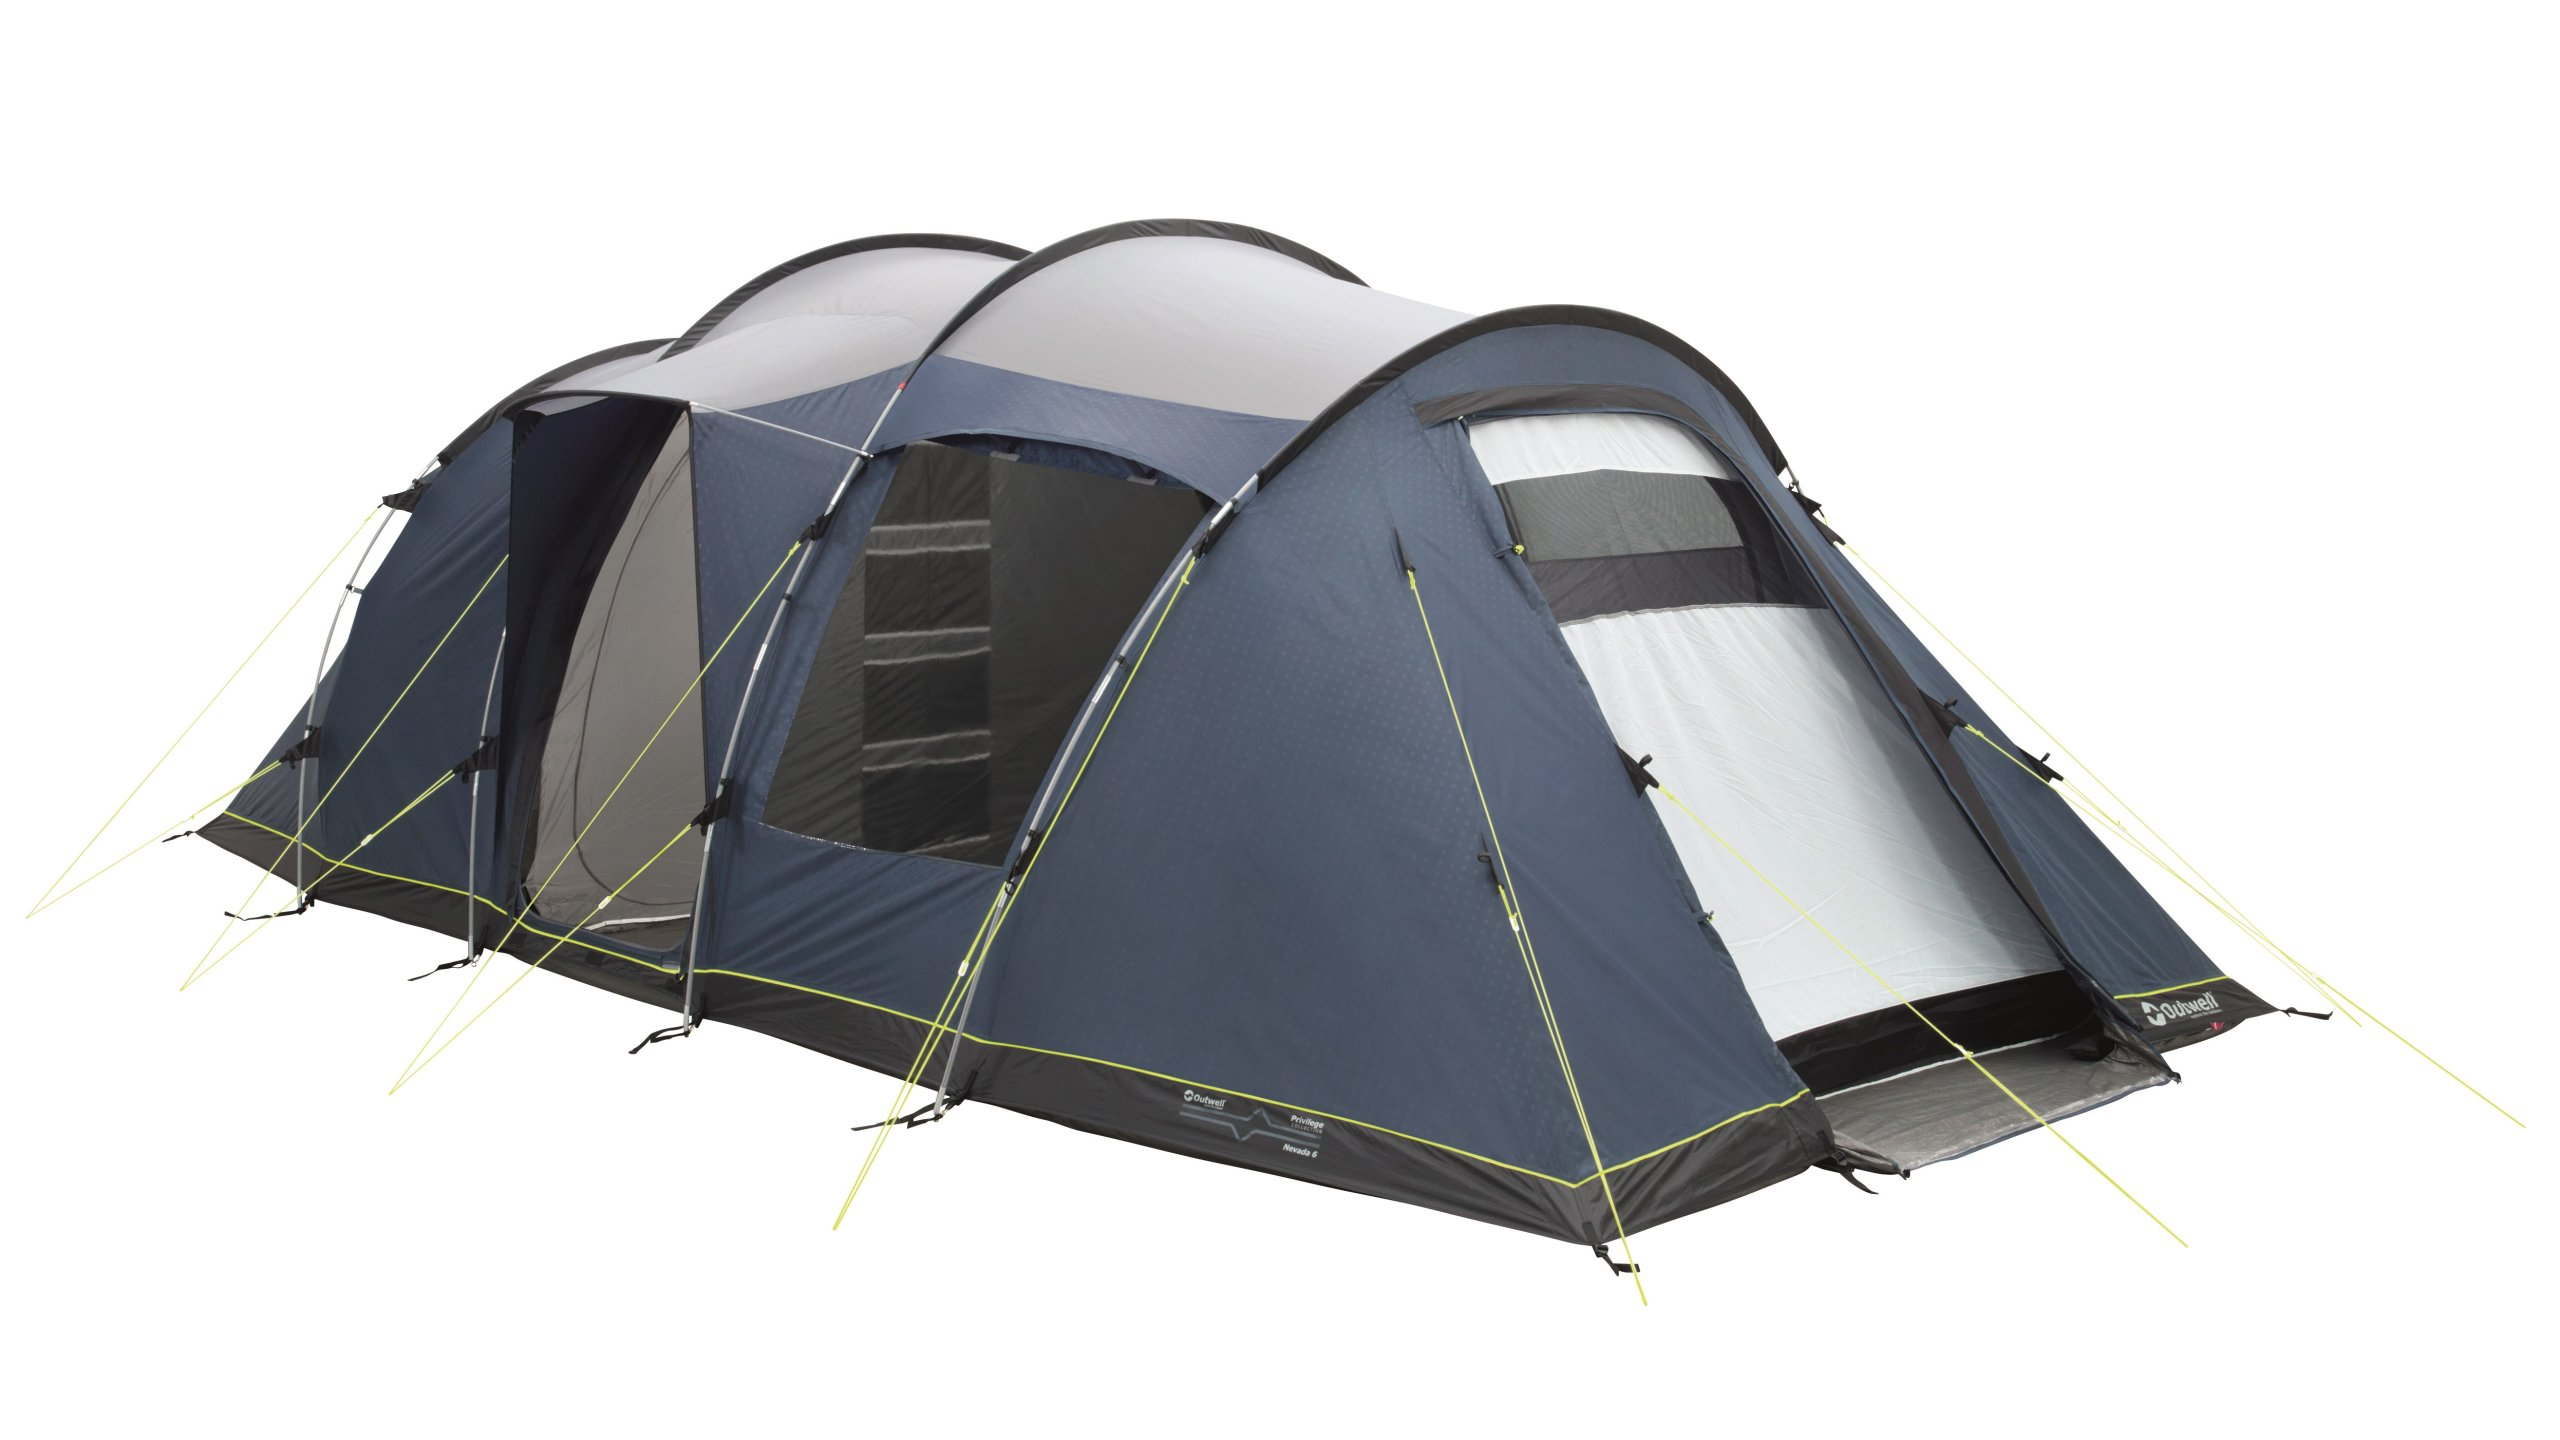 Namiot 6-osobowy Nevada 6 firmy Outwell